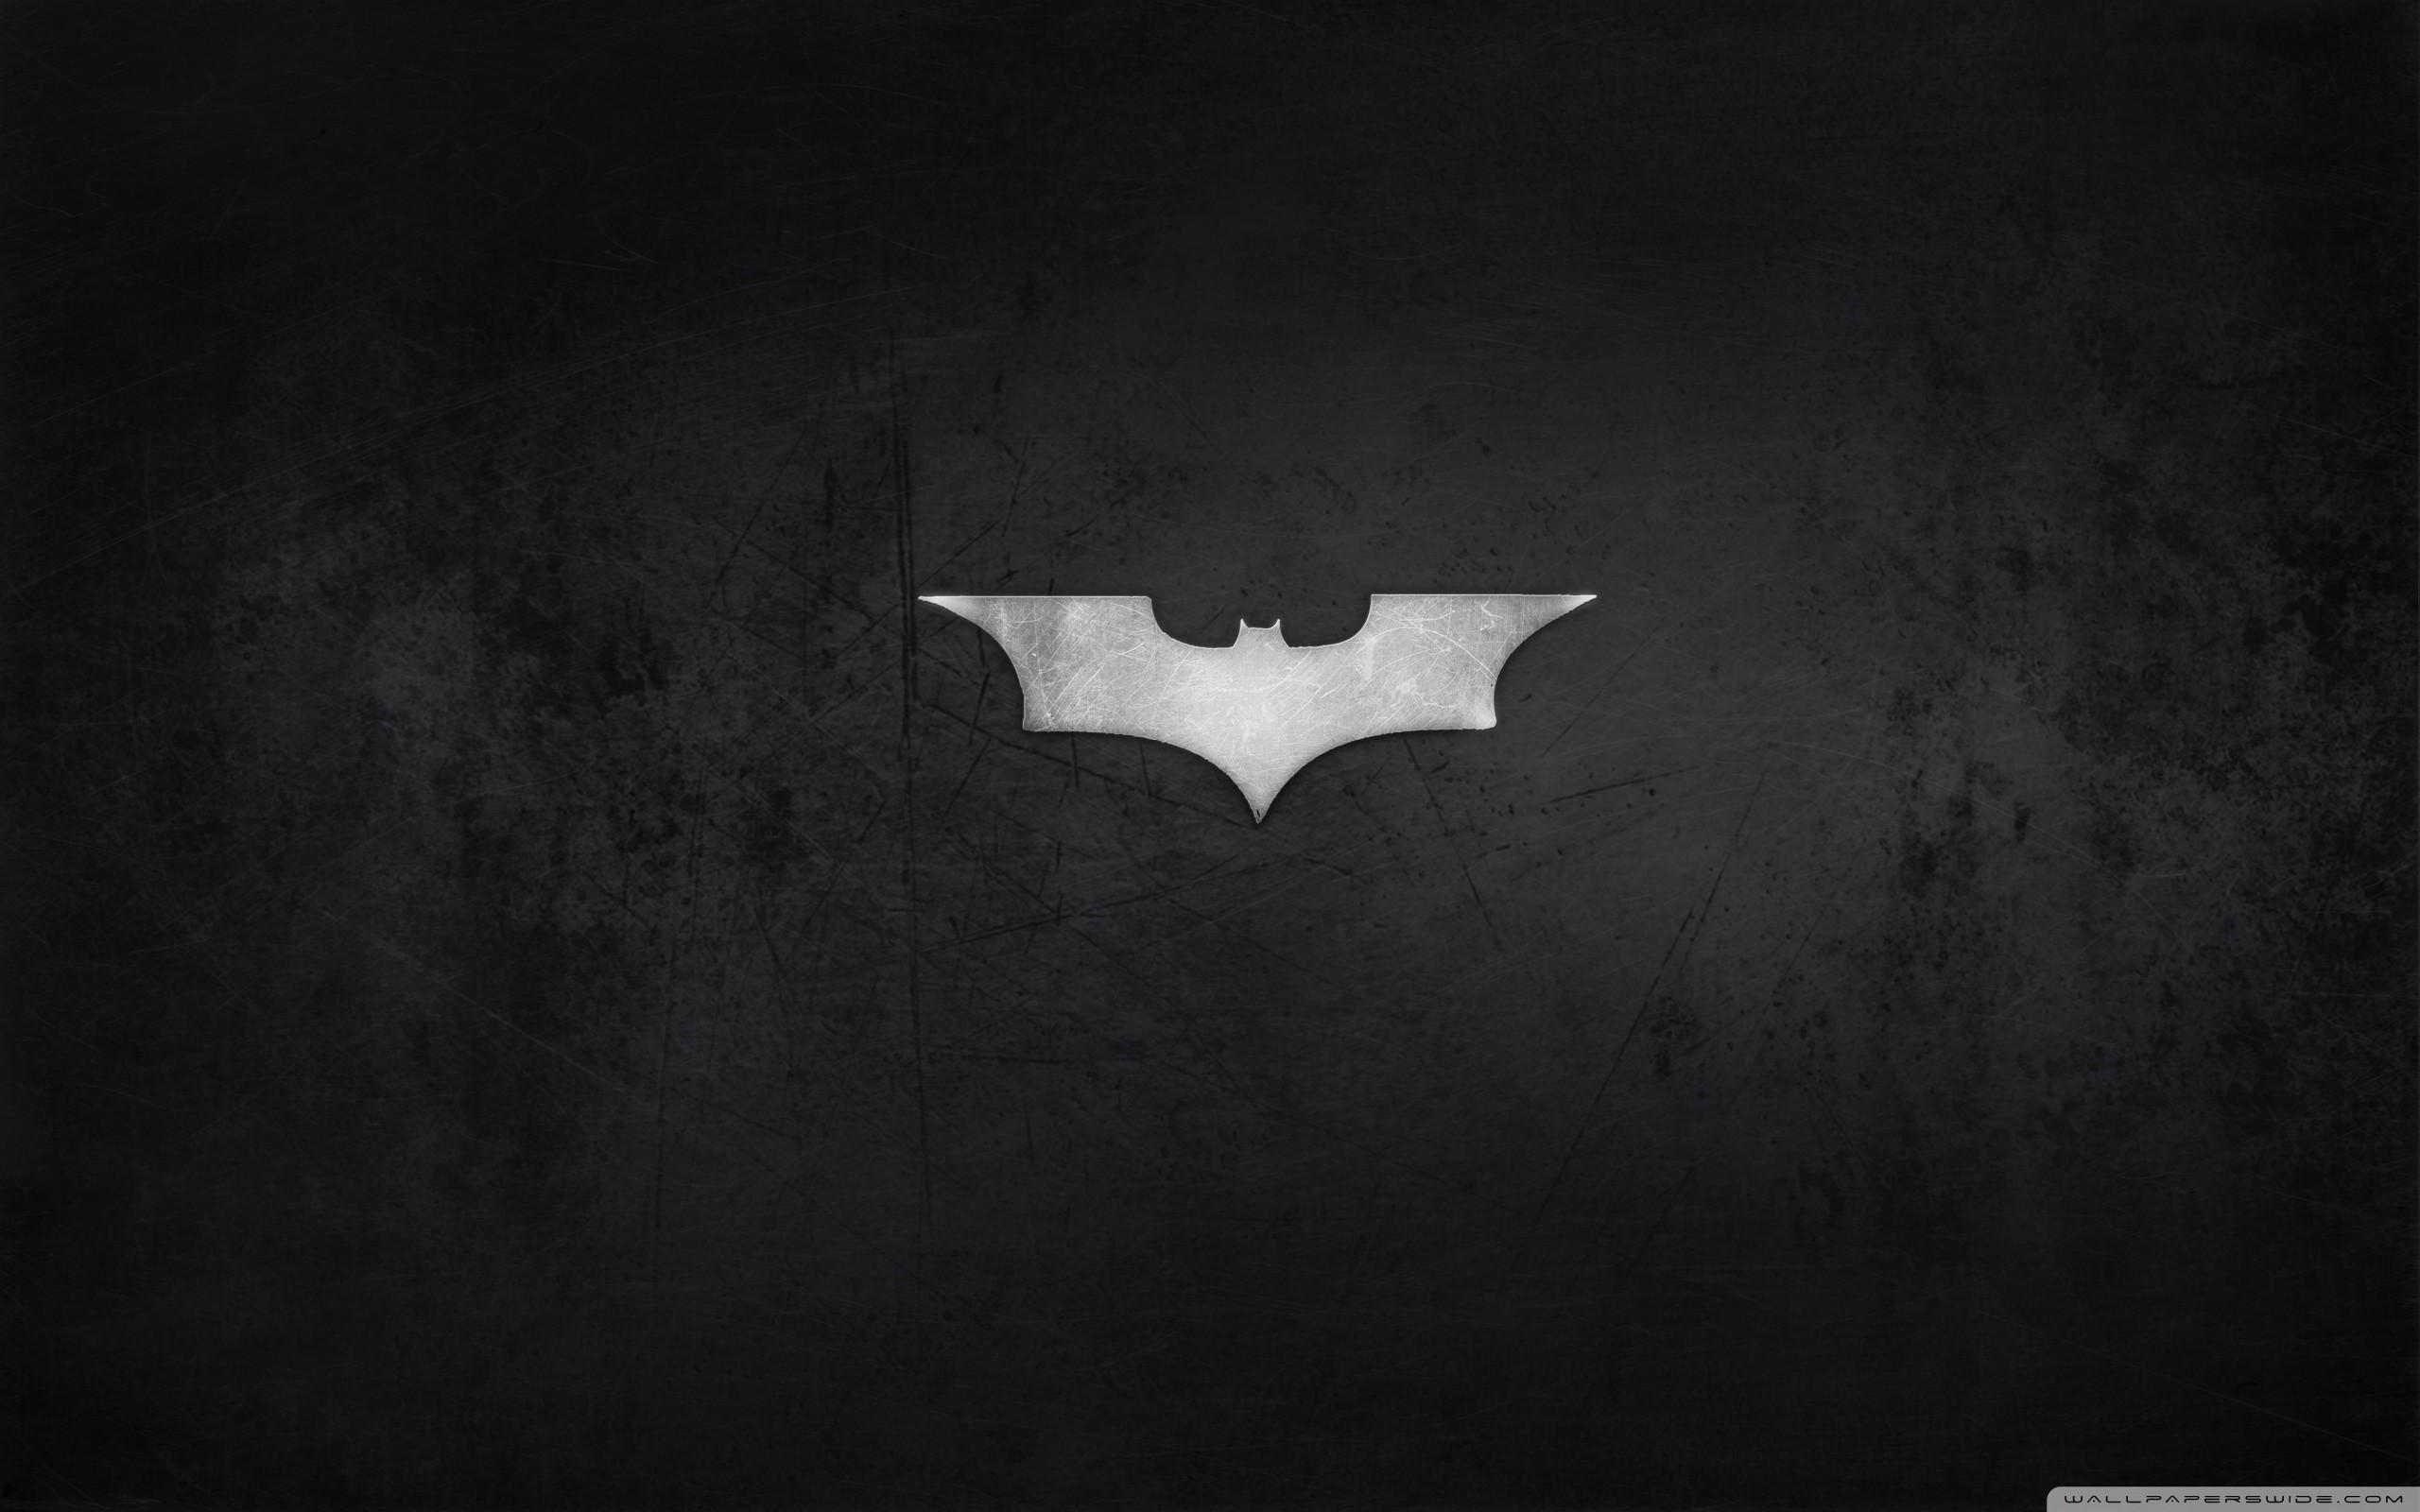 Batman Logo HD Wide Wallpaper for Widescreen